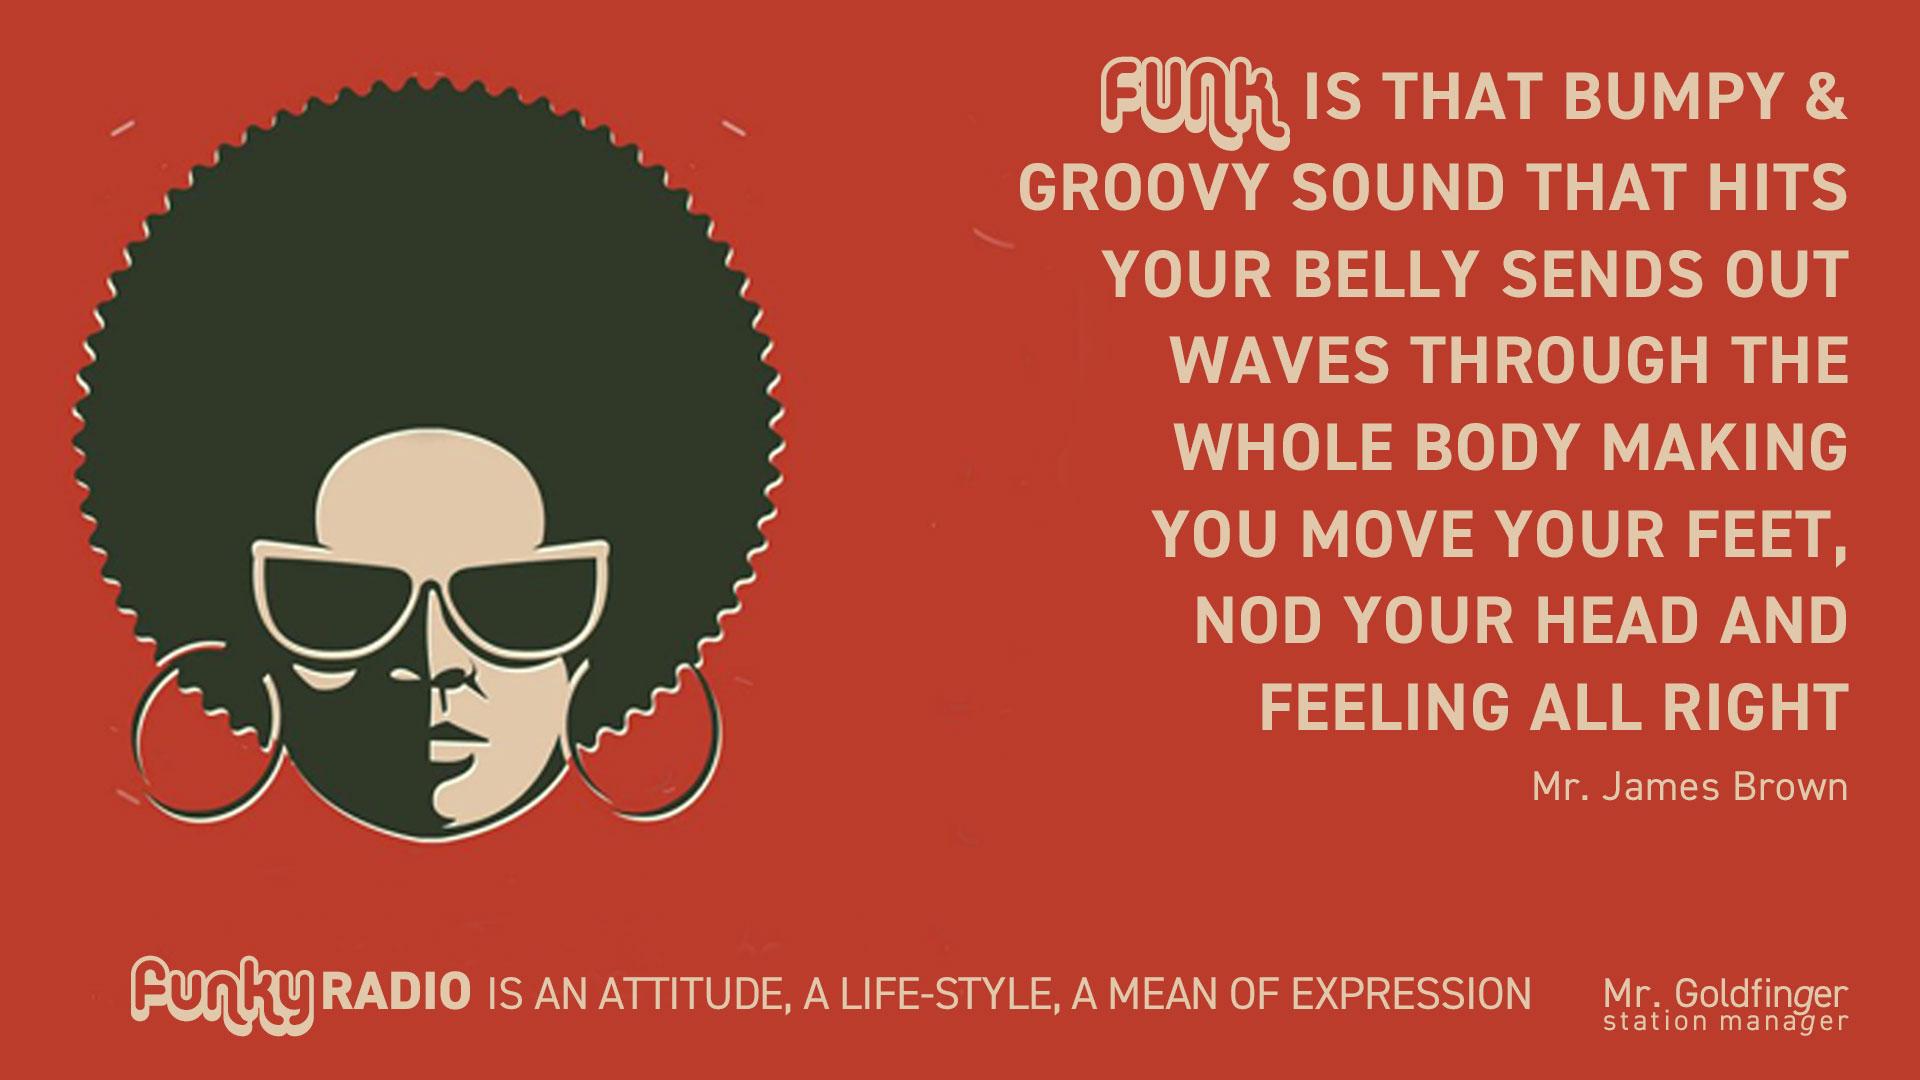 Funk Funky Radio FunkyRadio www.funky.radio Funk is